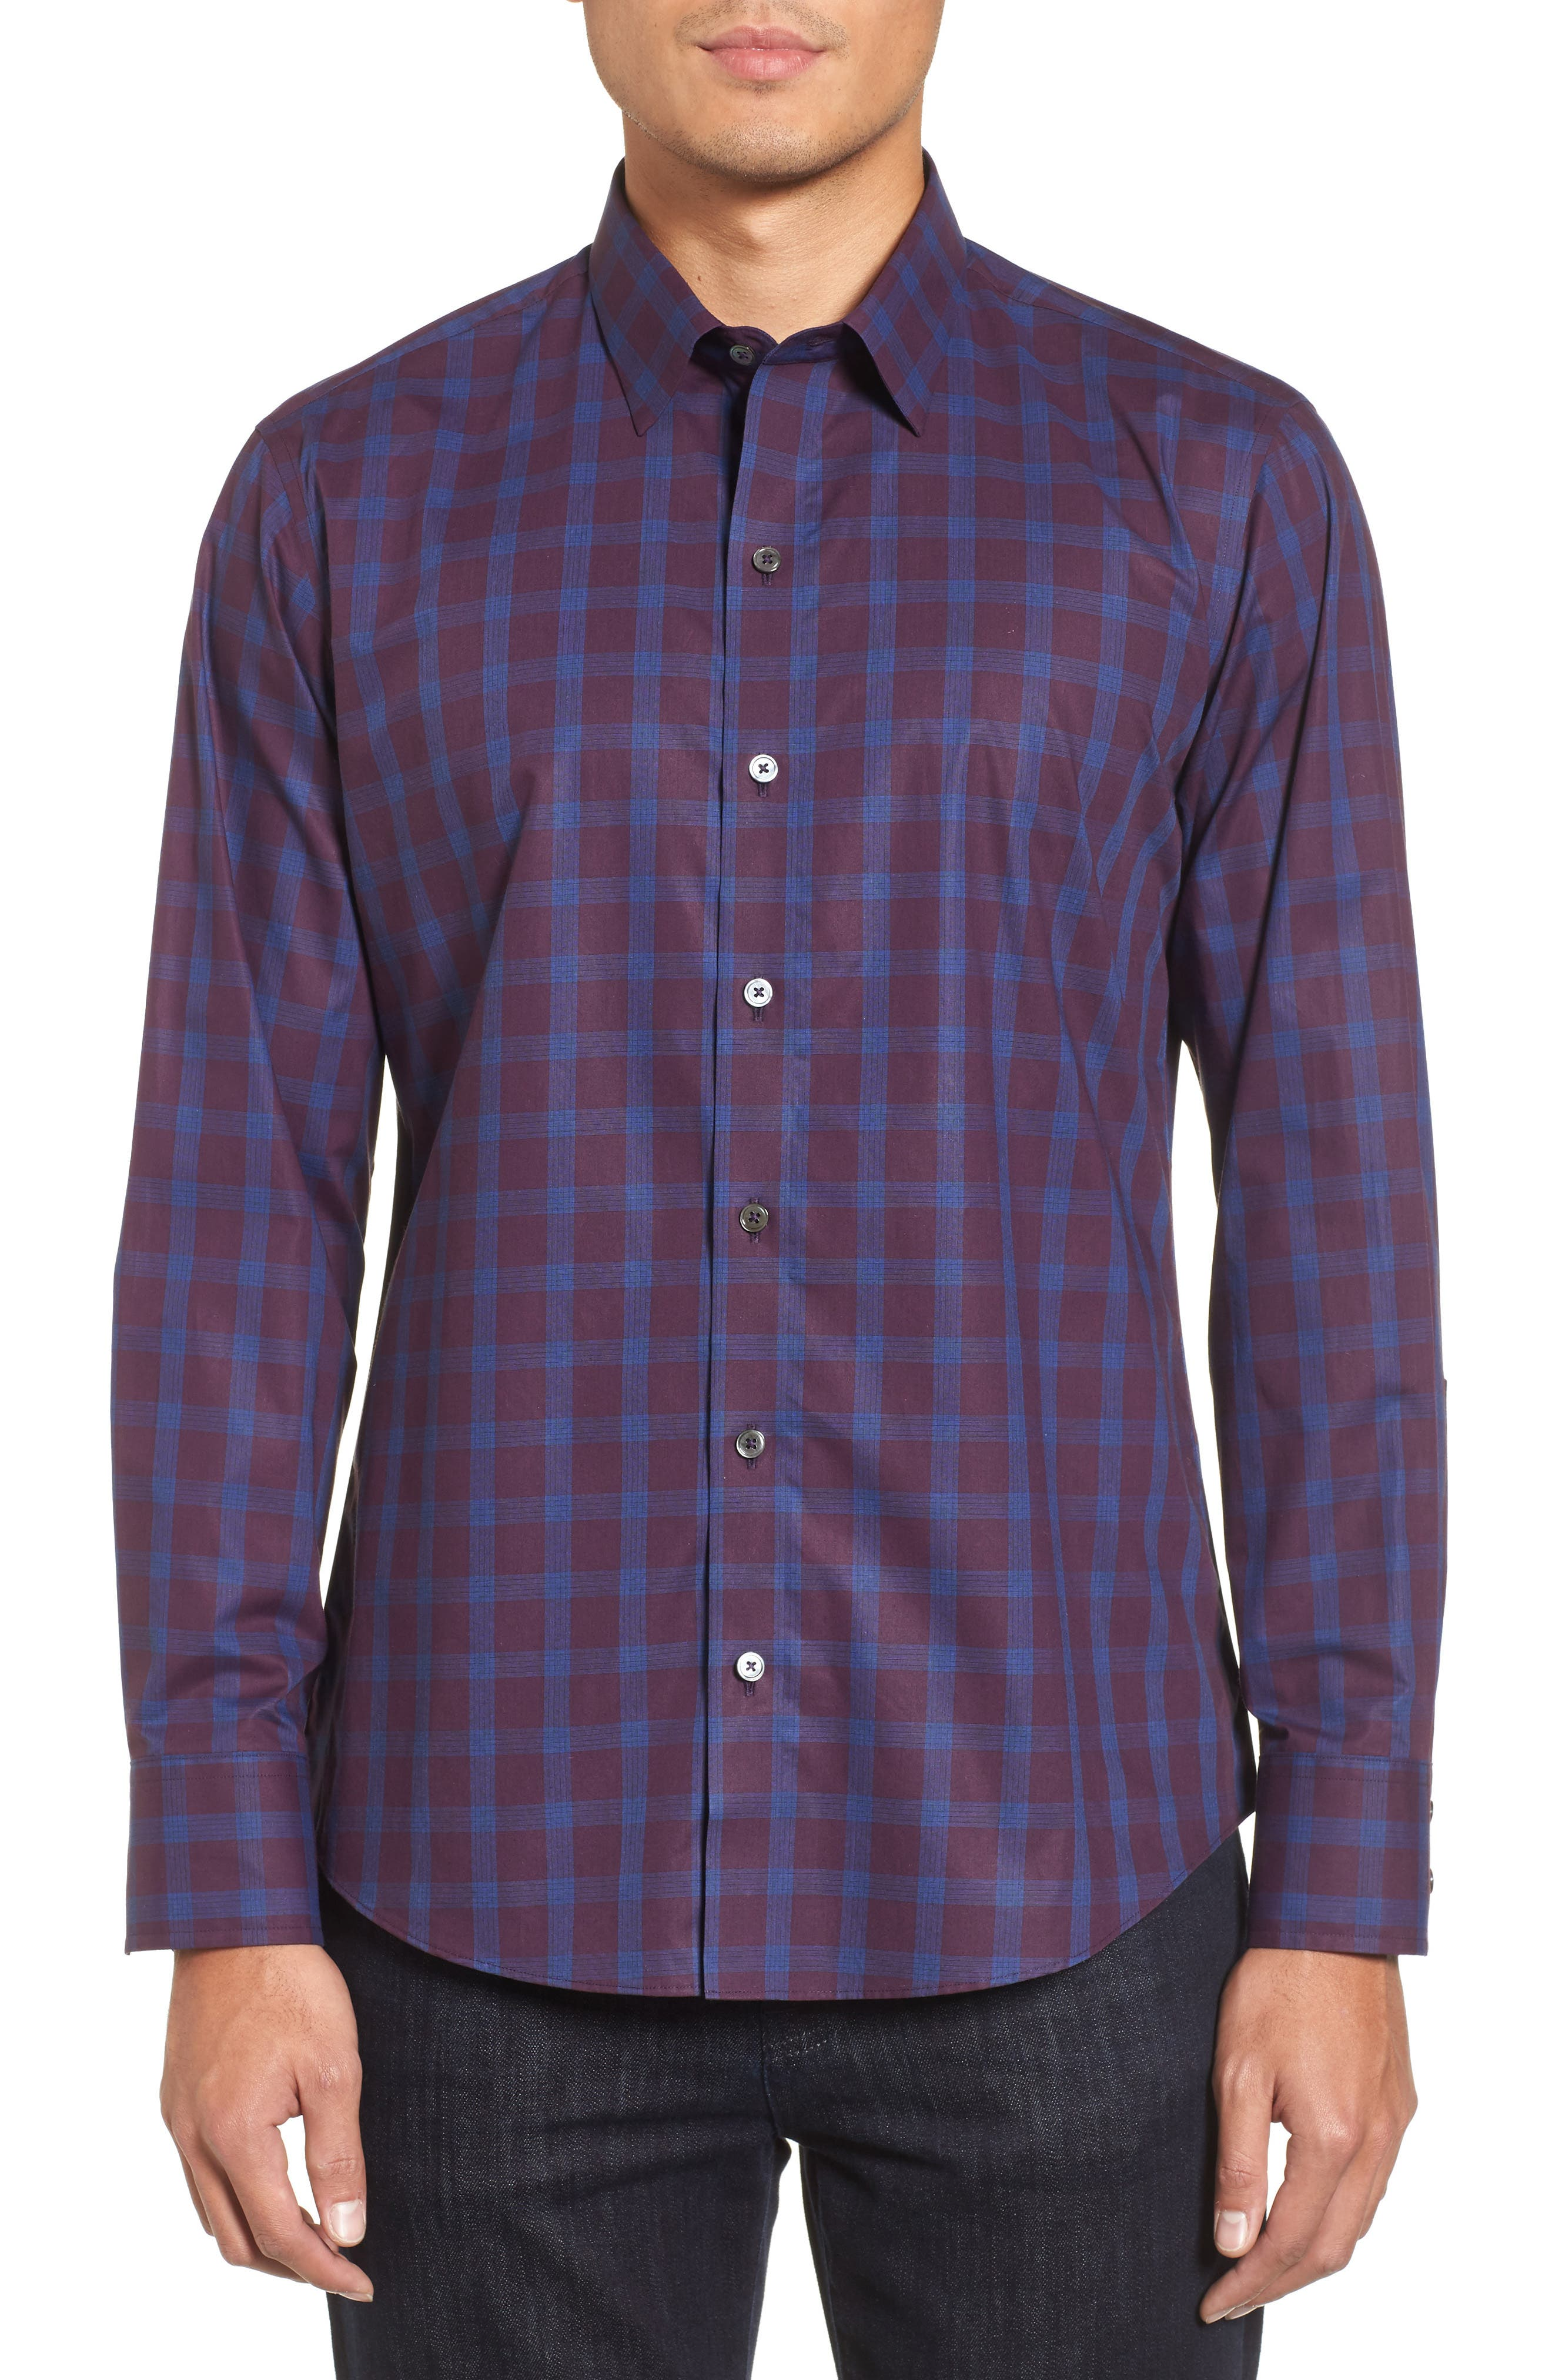 Raymond Check Sport Shirt,                             Main thumbnail 1, color,                             Burgundy